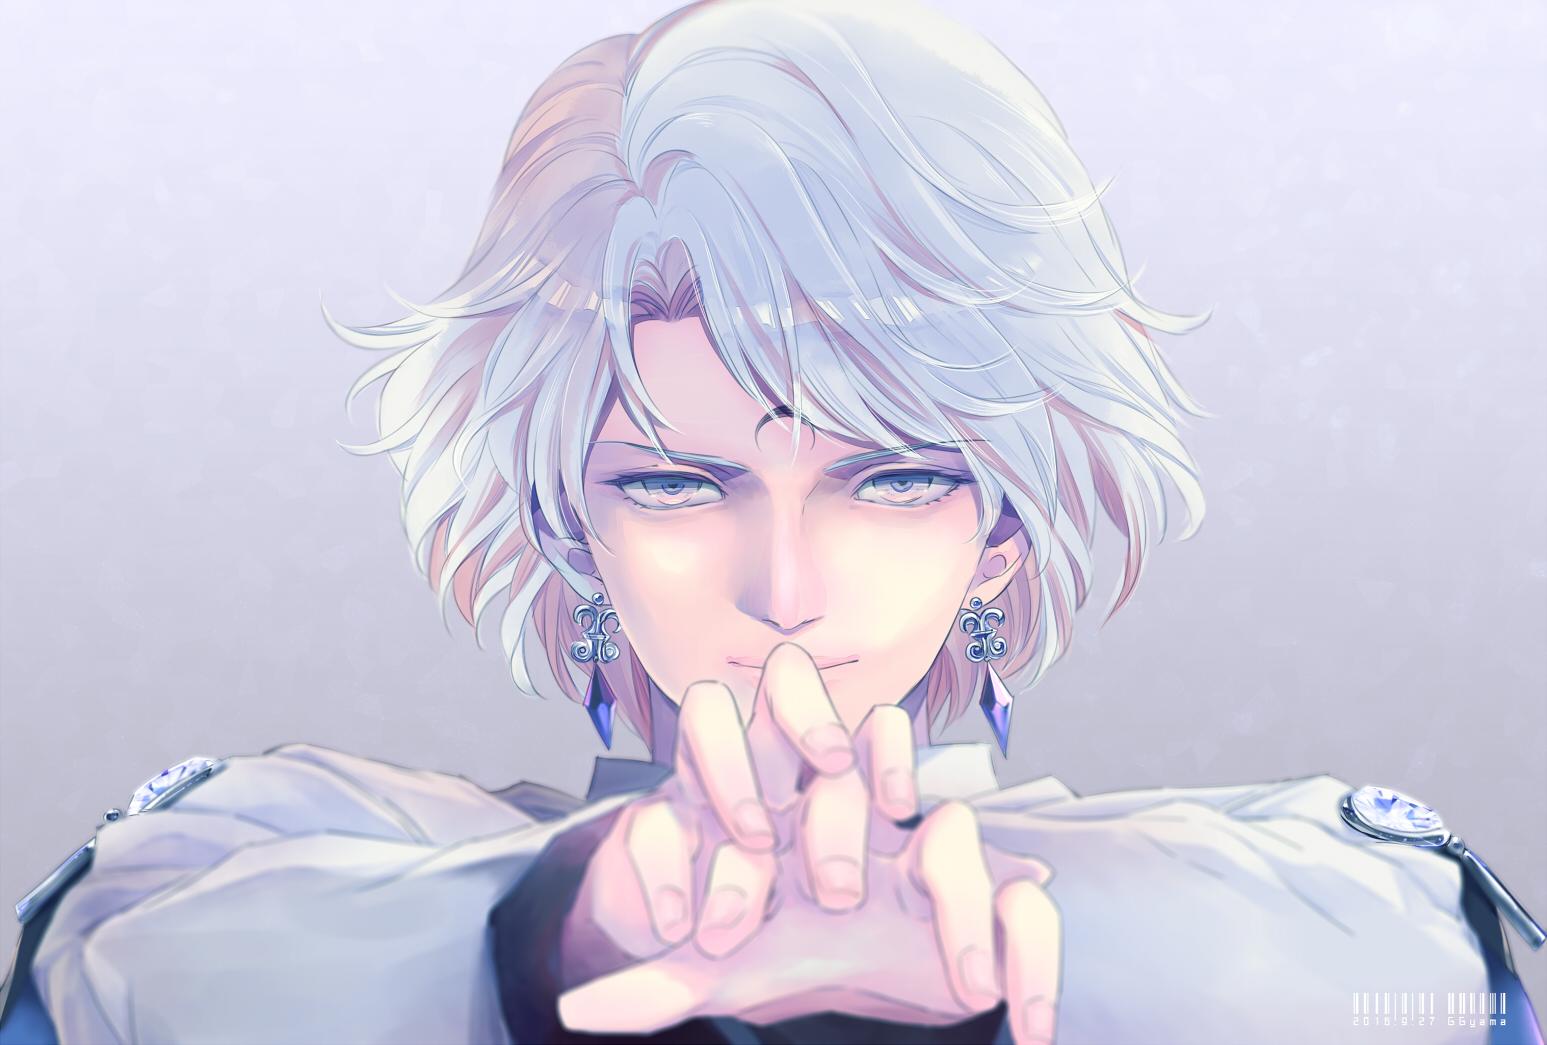 Prince Diamond - Bishoujo Senshi Sailor Moon - Image #465873 - Zerochan Anime Image Board